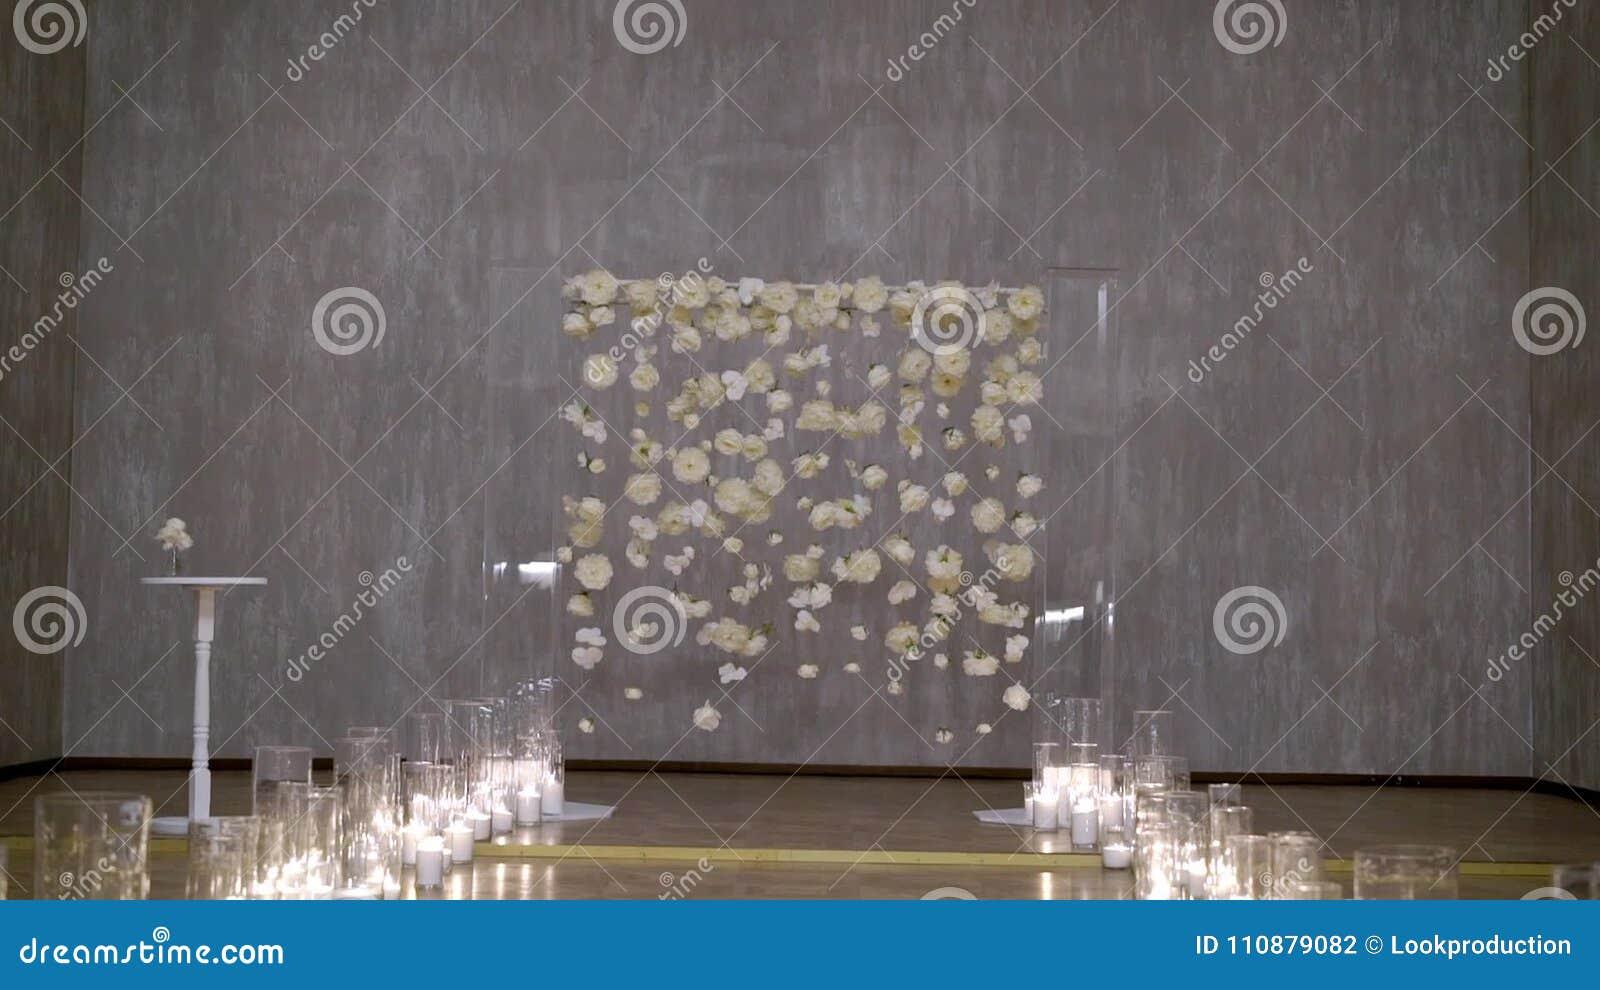 Wedding ceremony decoration stock footage video of composition wedding ceremony decoration stock footage video of composition candle 110879082 junglespirit Images